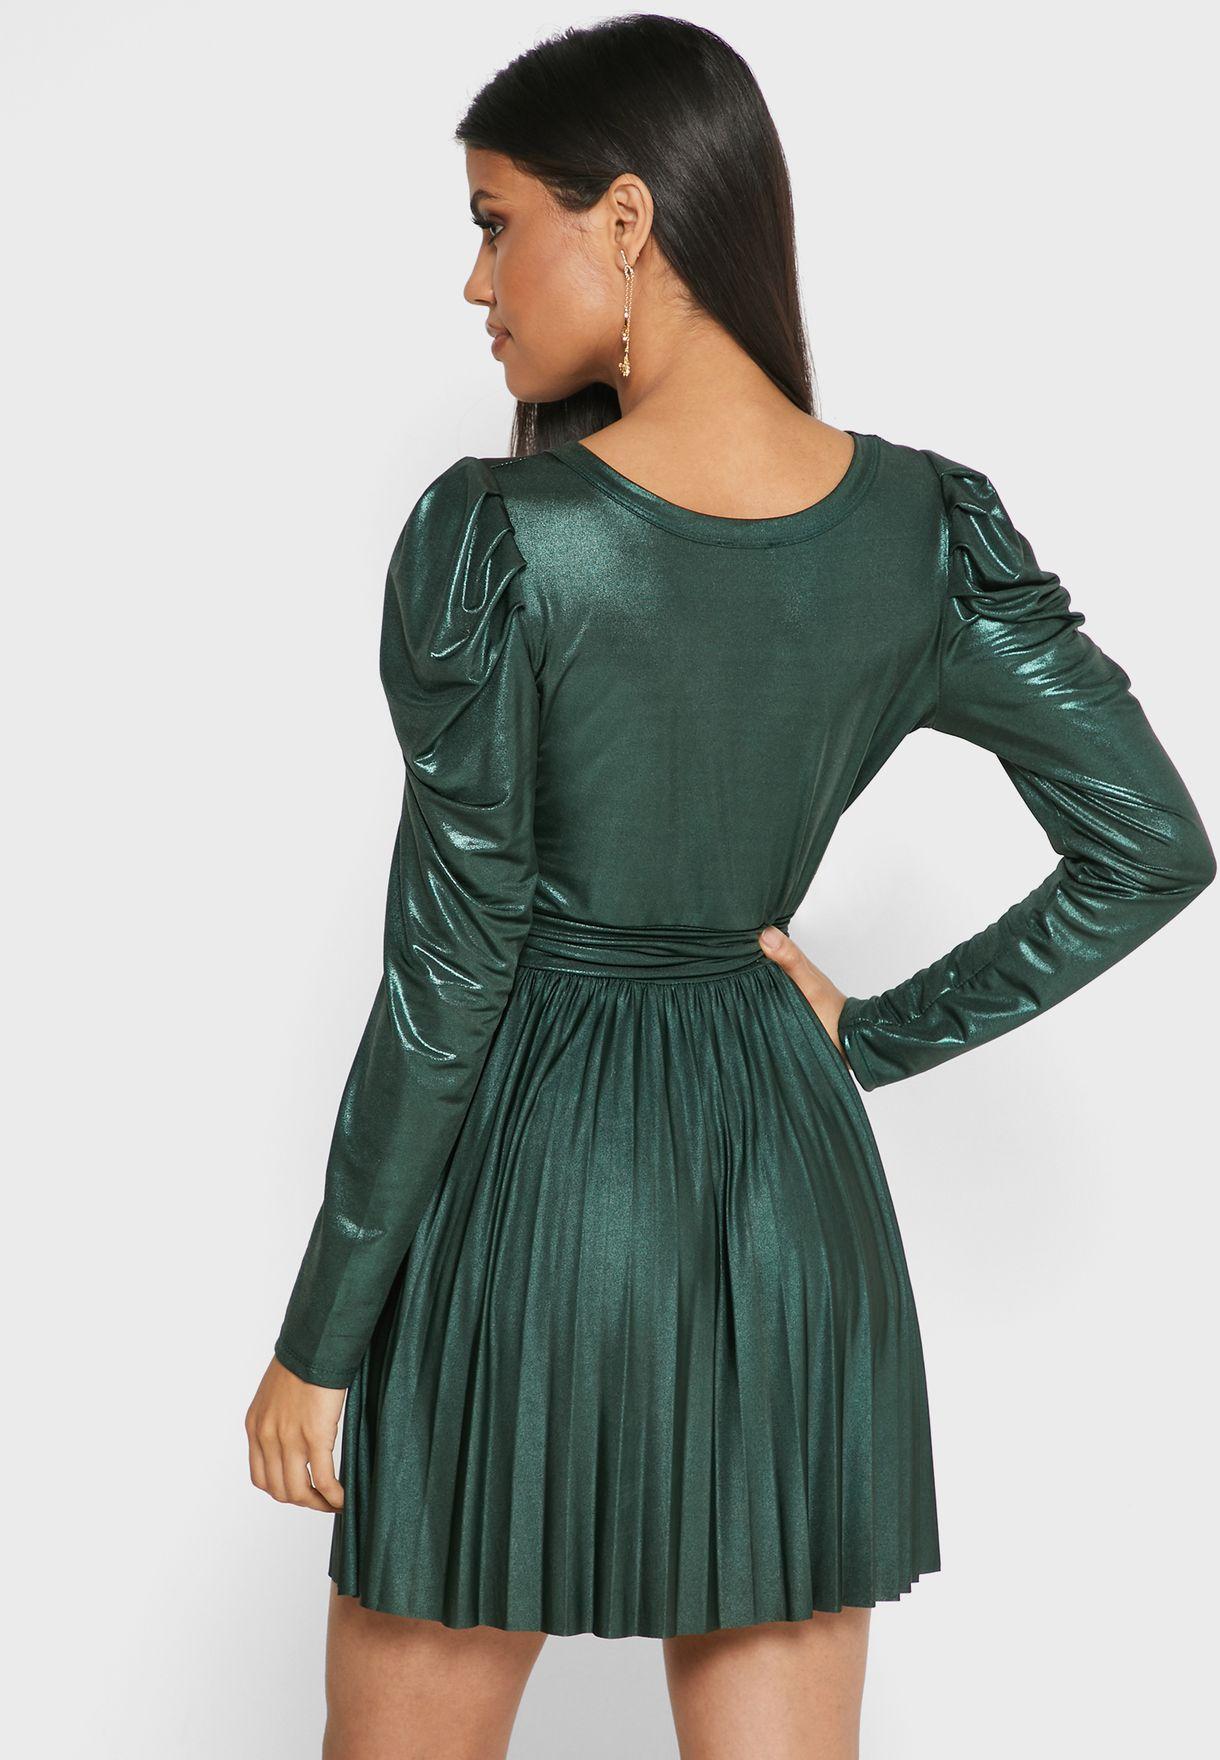 Metallic Pleated Skirt Mini Dress